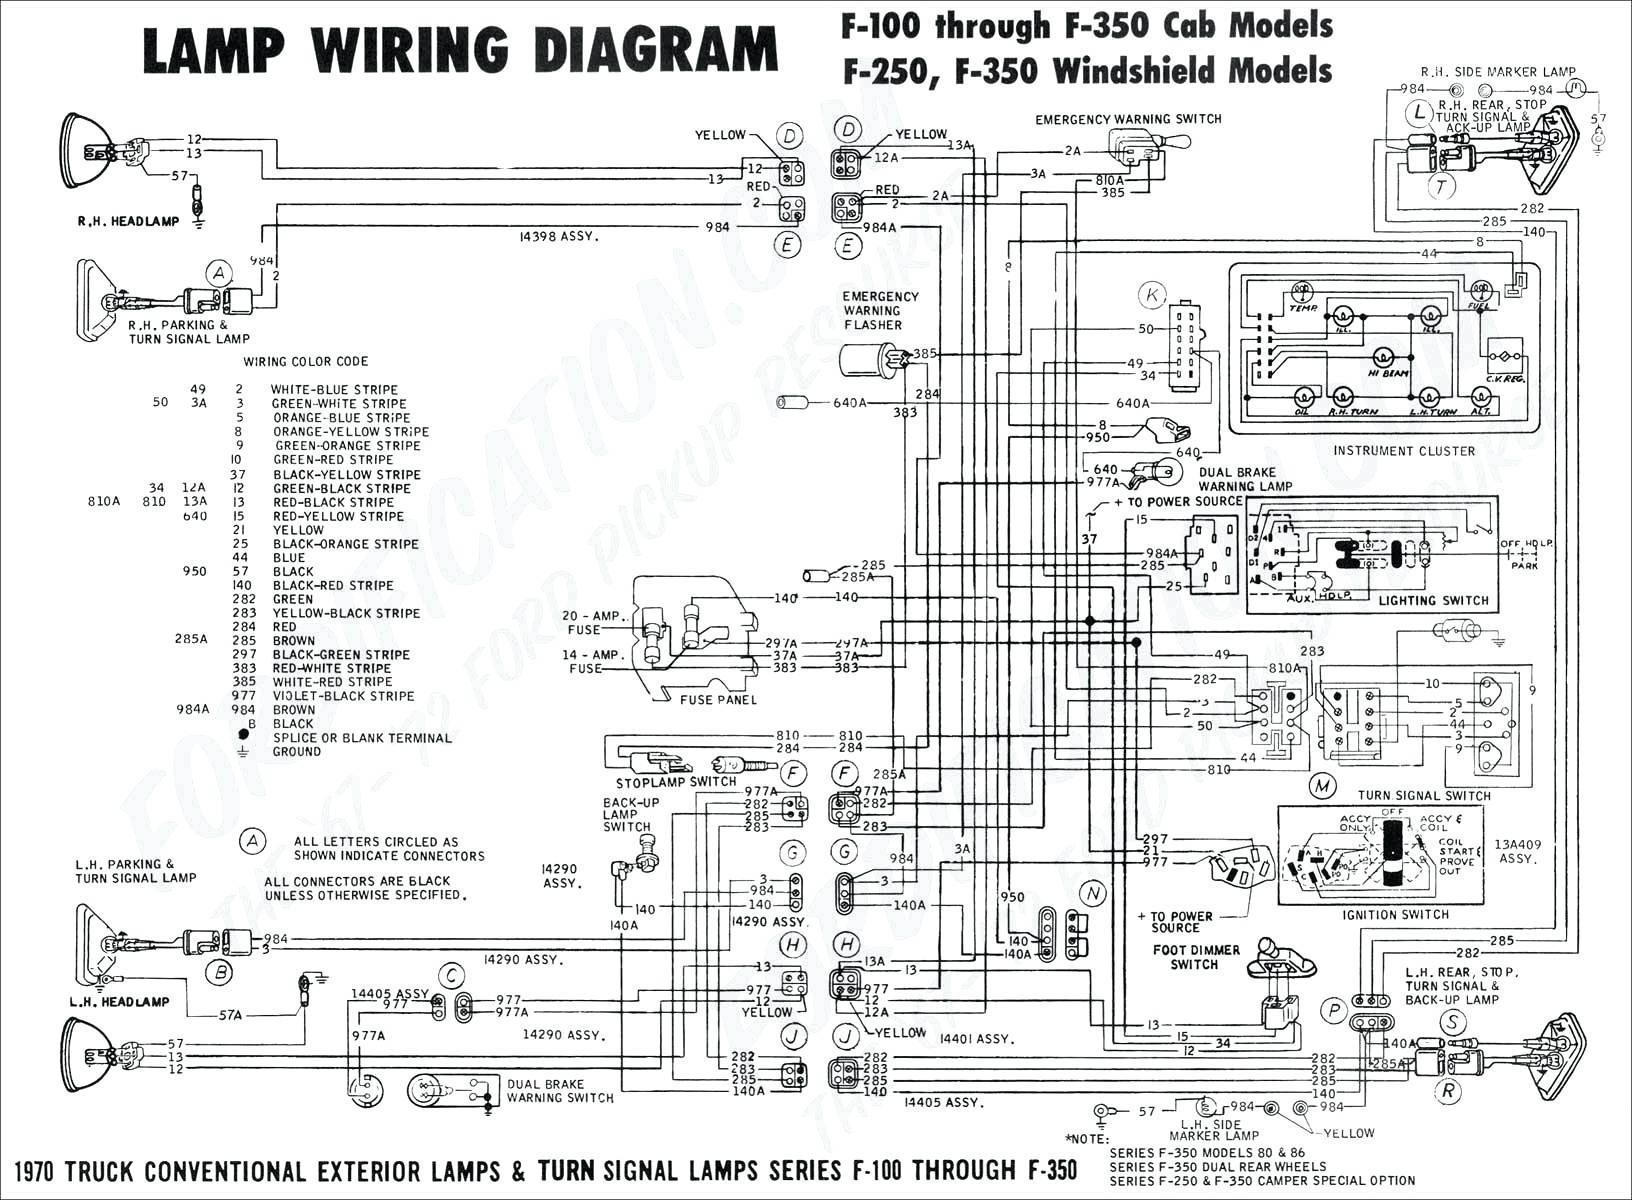 2002 Nissan Xterra Engine Diagram 2010 Xterra Wiring Diagram Wiring Diagram Datasource Of 2002 Nissan Xterra Engine Diagram 2006 Nissan Altima Relay Diagram Including 2003 Nissan Xterra Air